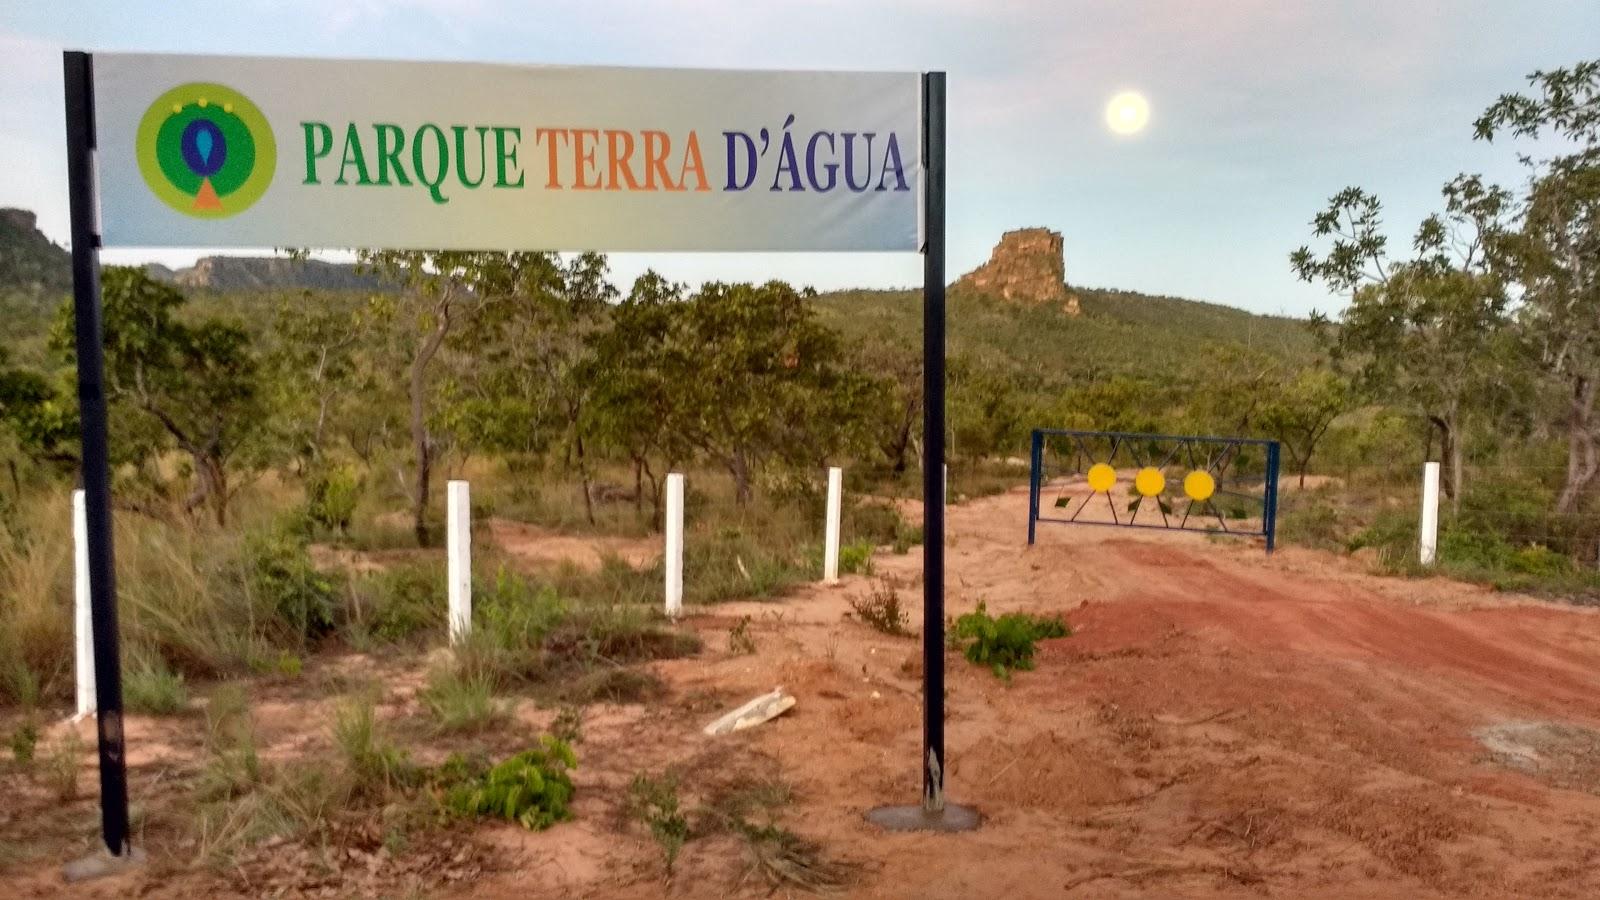 Parque Terra D'Água